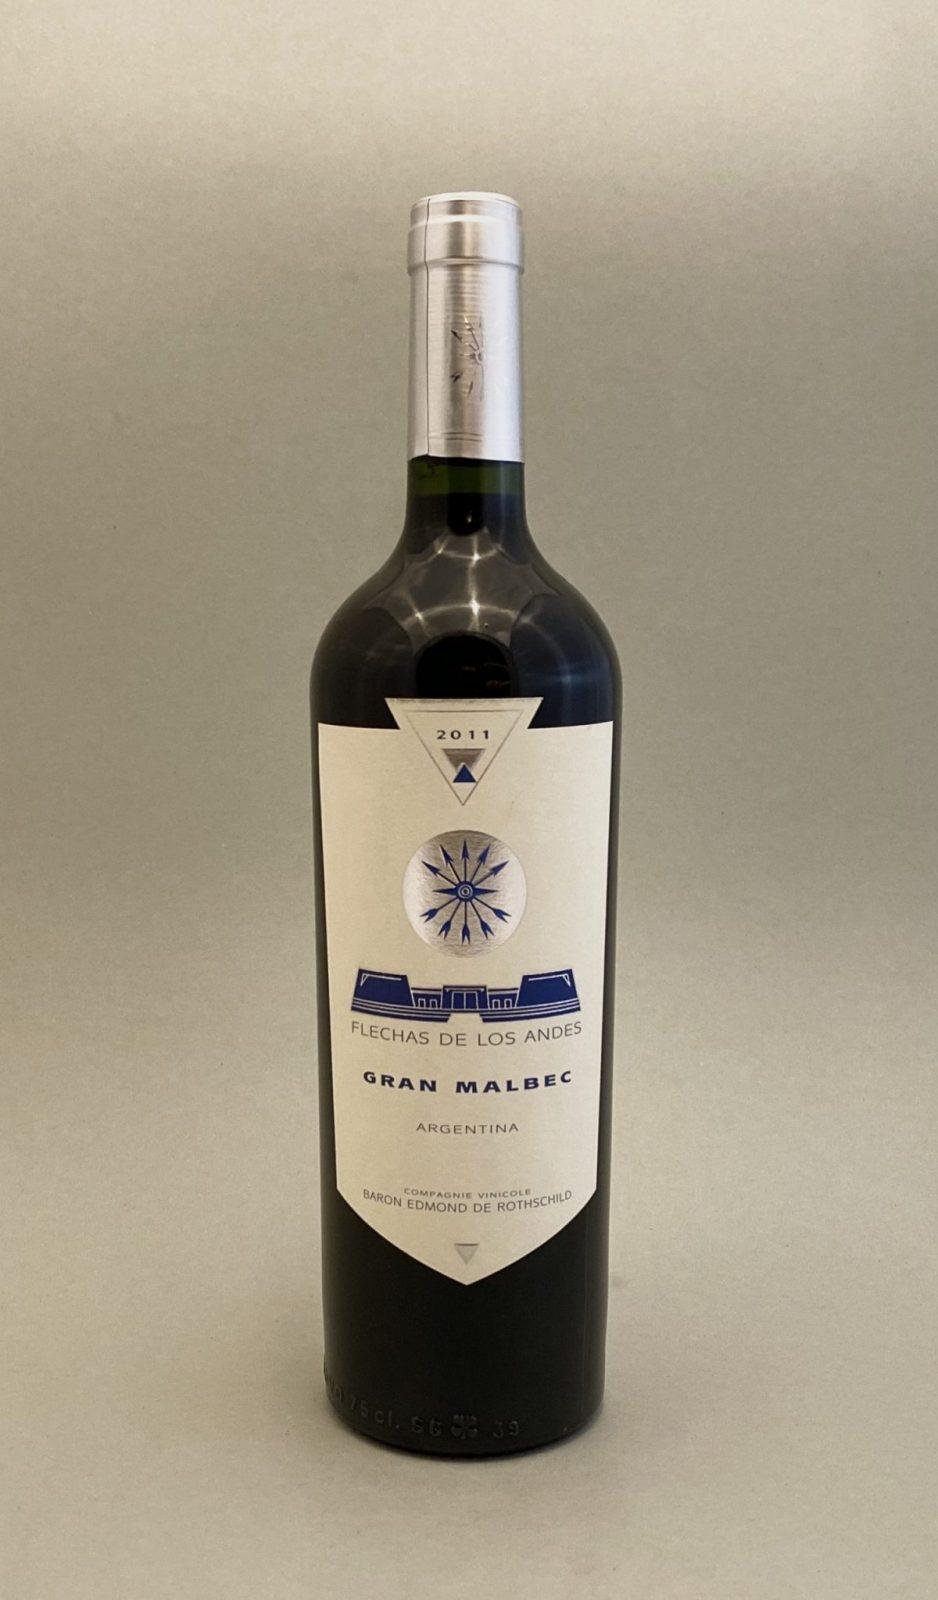 FLECHAS DE LOS ANDES Gran Malbec 2011, vinoteka slnecnice Bratislava mesto, petrzalka, vino cervene z Argentiny